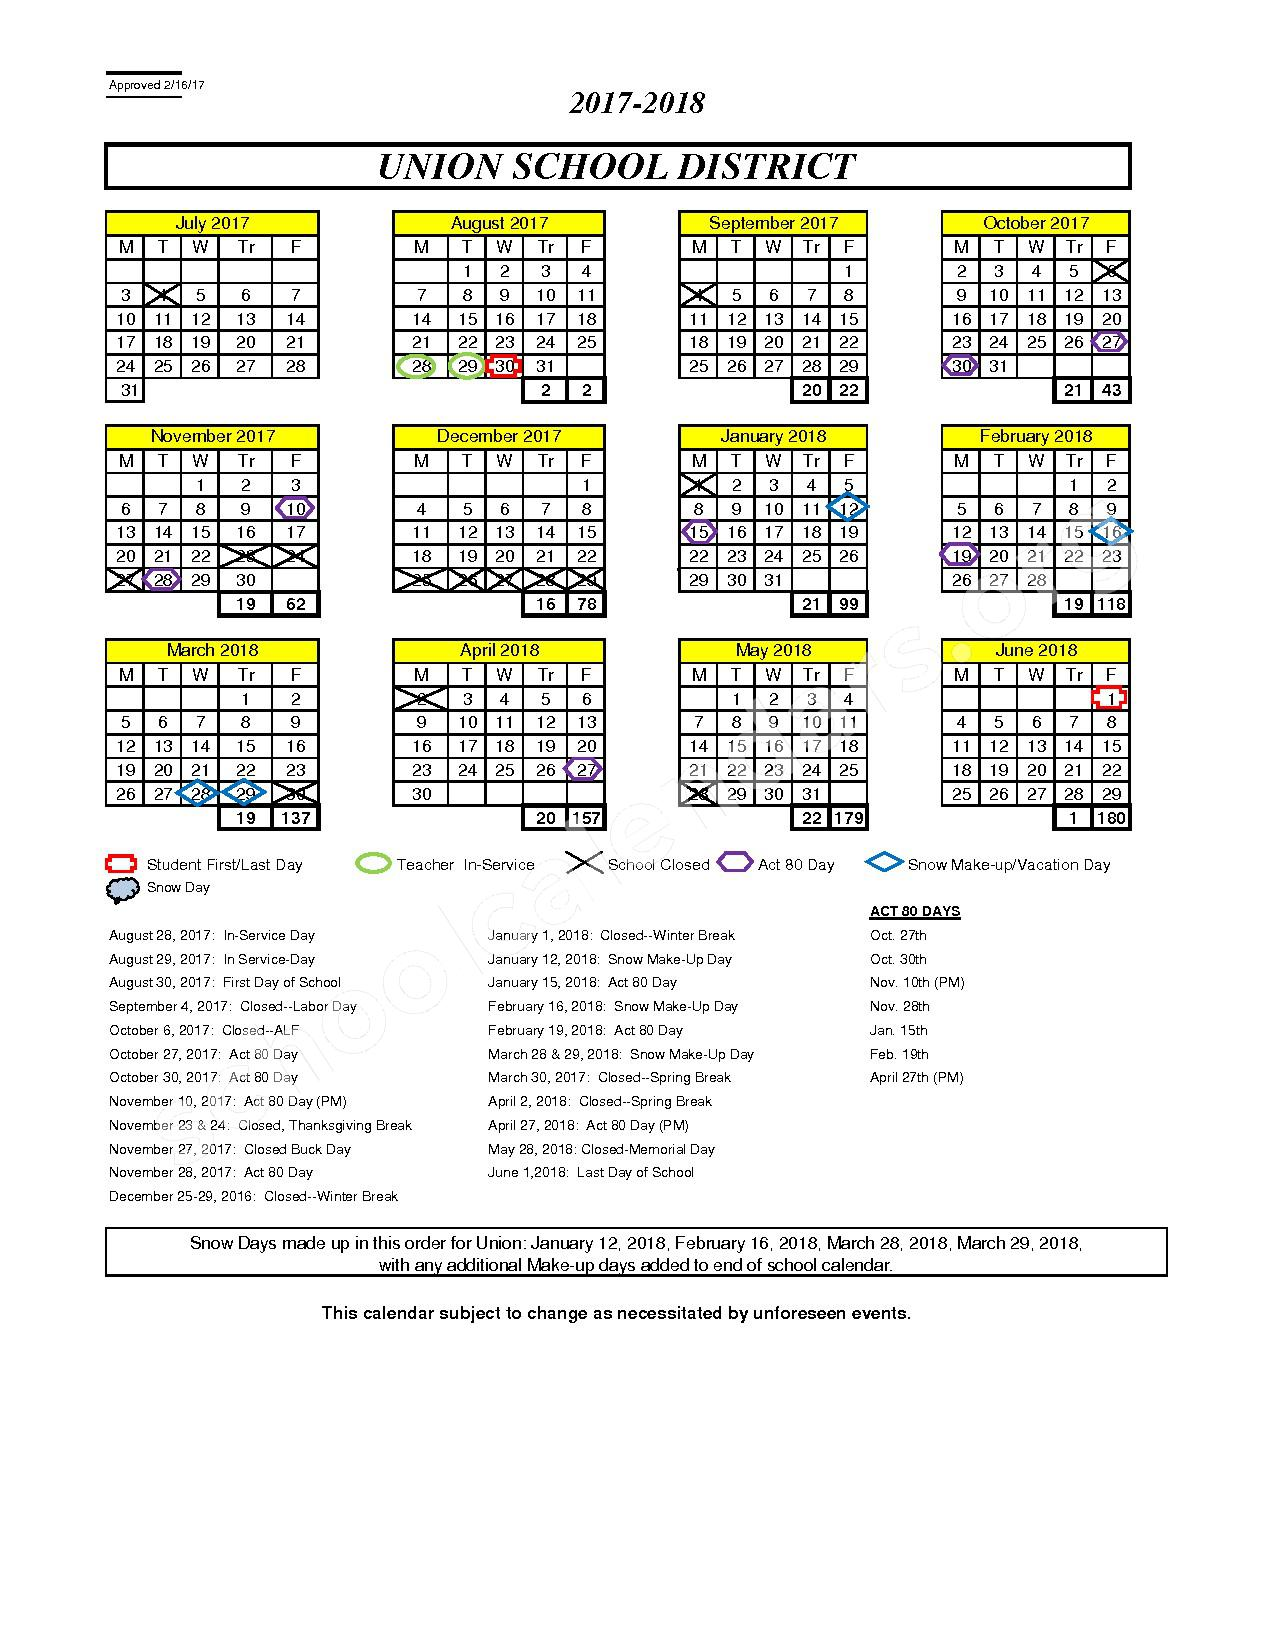 2017 - 2018 Academic Calendar – Union School District – page 1